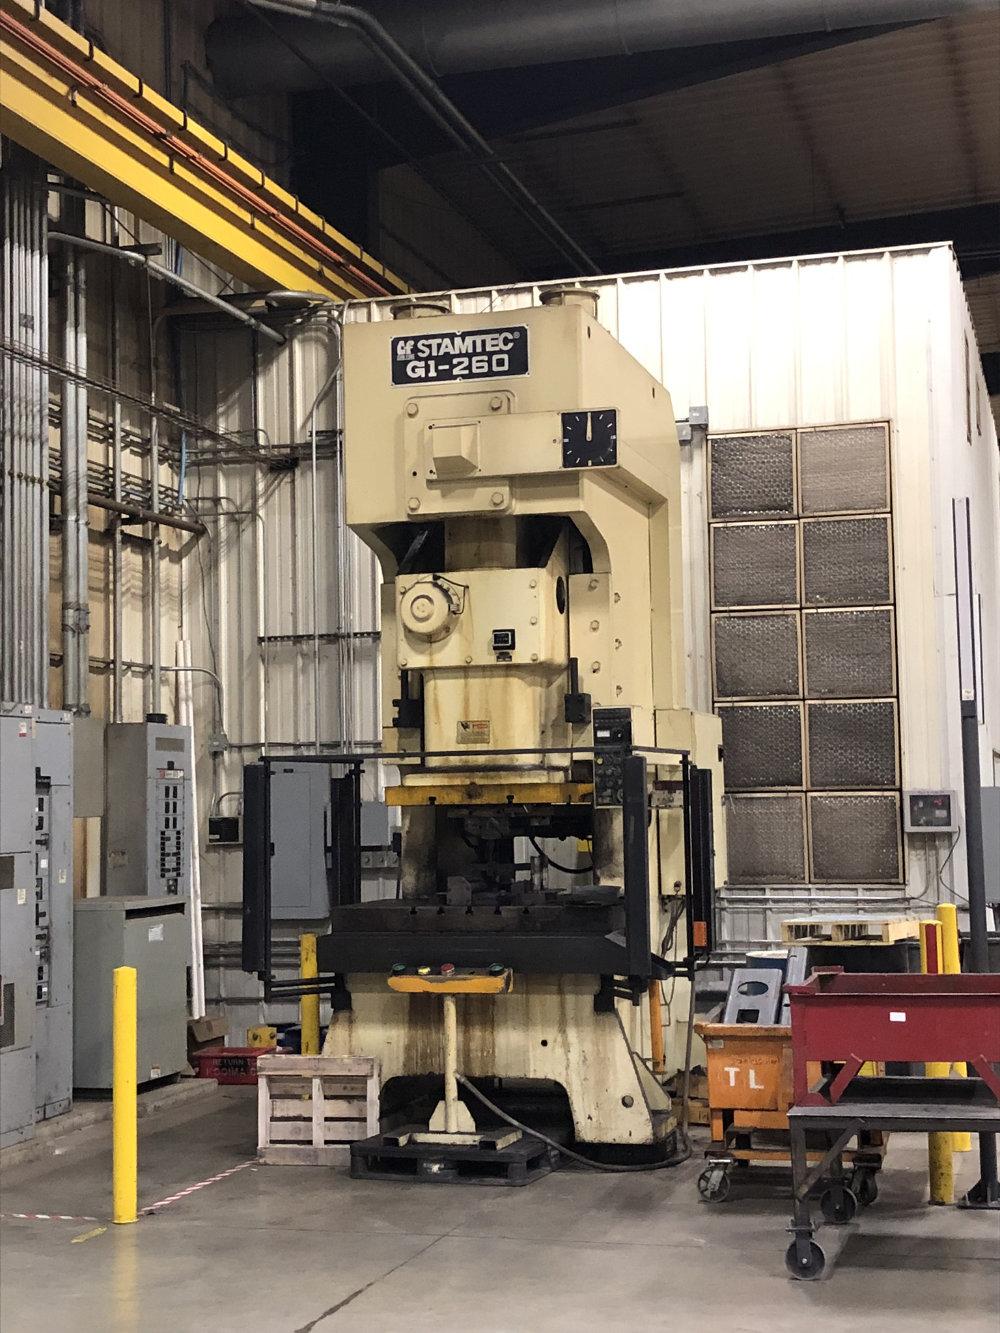 "Stamtec G1-260 Gap Frame Press, 286 Tons, 20-40 SPM, 59"" x 33"" Bed, Air Clutch / Brake"